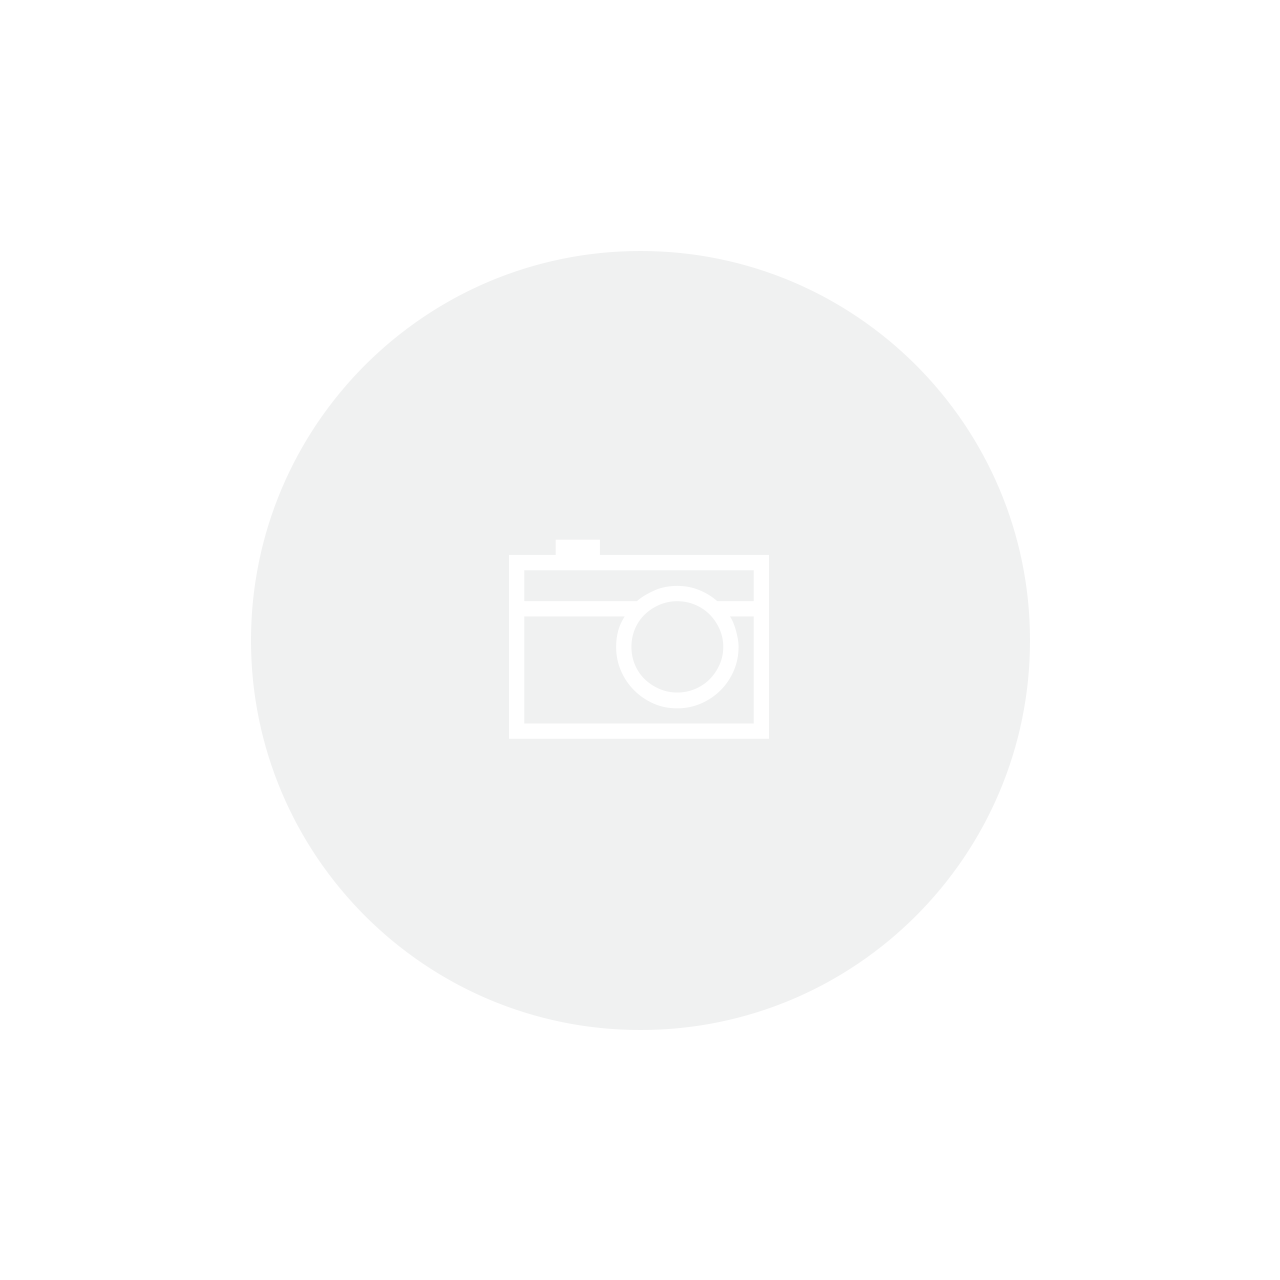 Açucareiro Aço Inox 2 Peças 0,55l Continental Tramontina